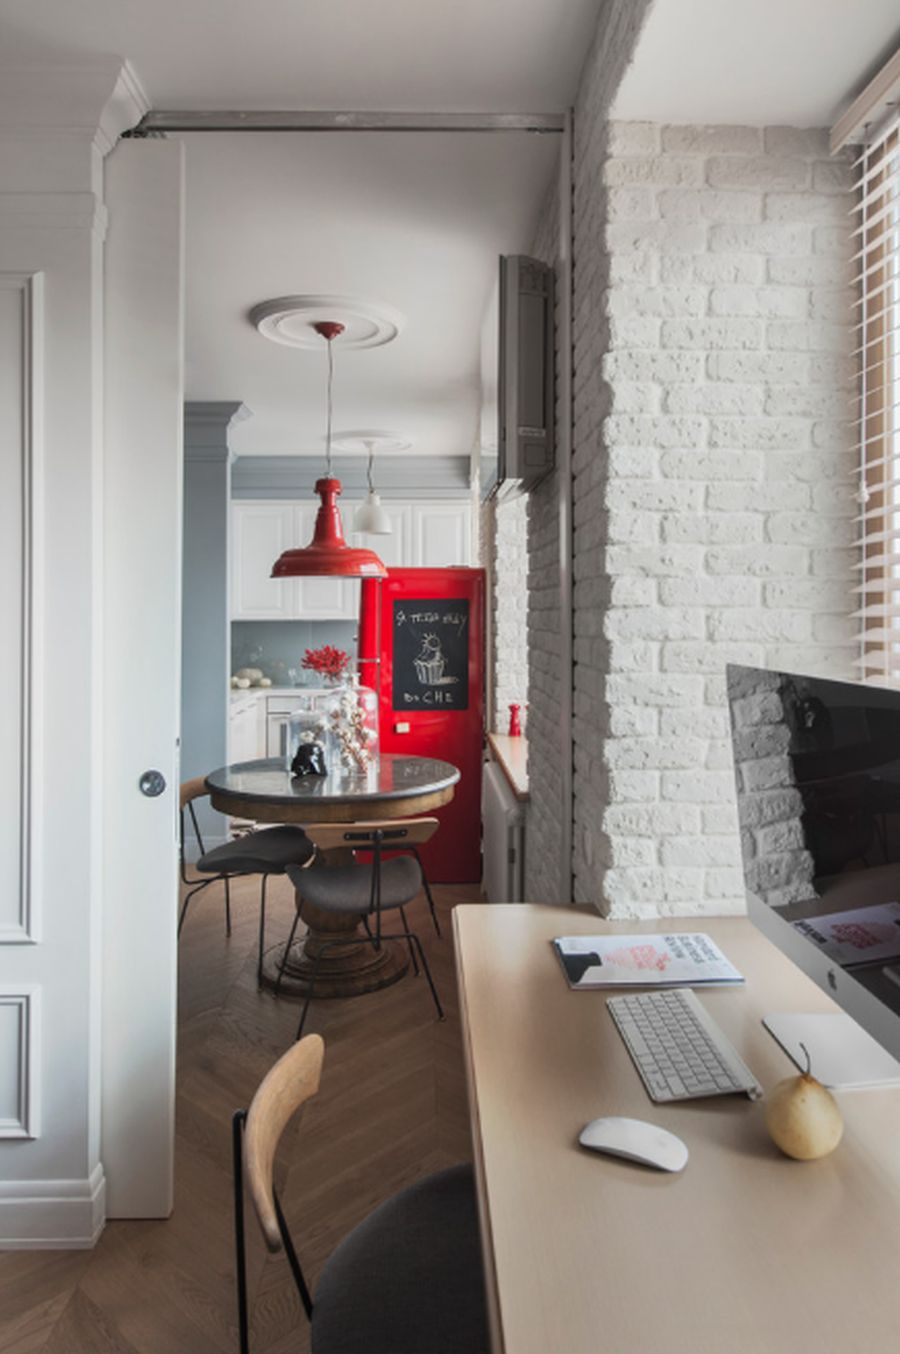 adelaparvu-com-despre-reoganizarea-unui-apartament-de-2-camere-in-3-camere-54-mp-designer-masha-kunyakina-foto-olga-melekesceva-13